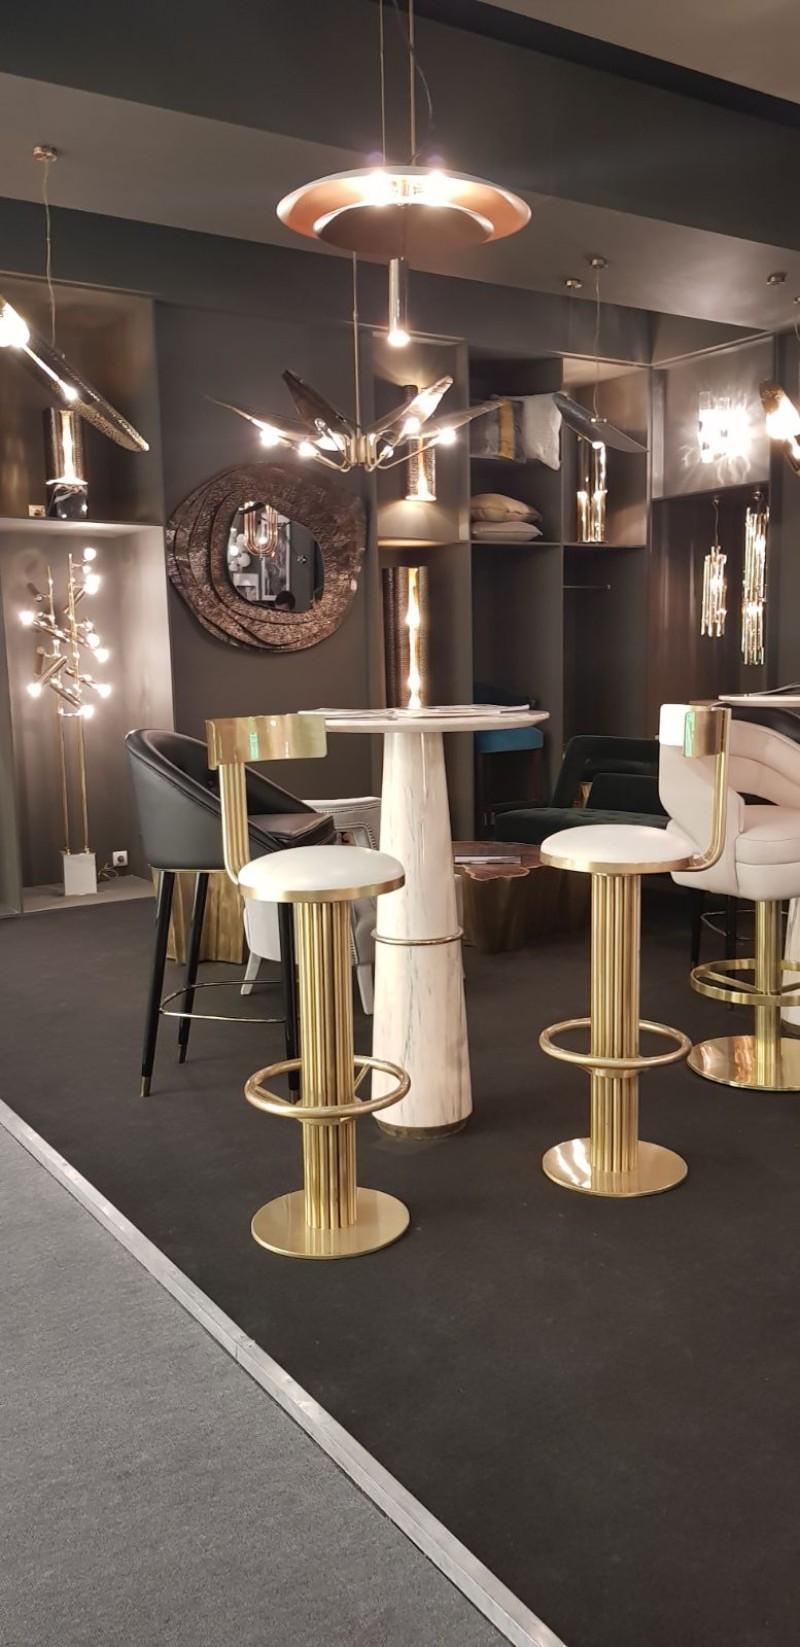 luxusmarken Top 5 Luxusmarken in der Frankfurt Messe bfe990a7 d0ca 4e63 a0be 942e4e5869d5